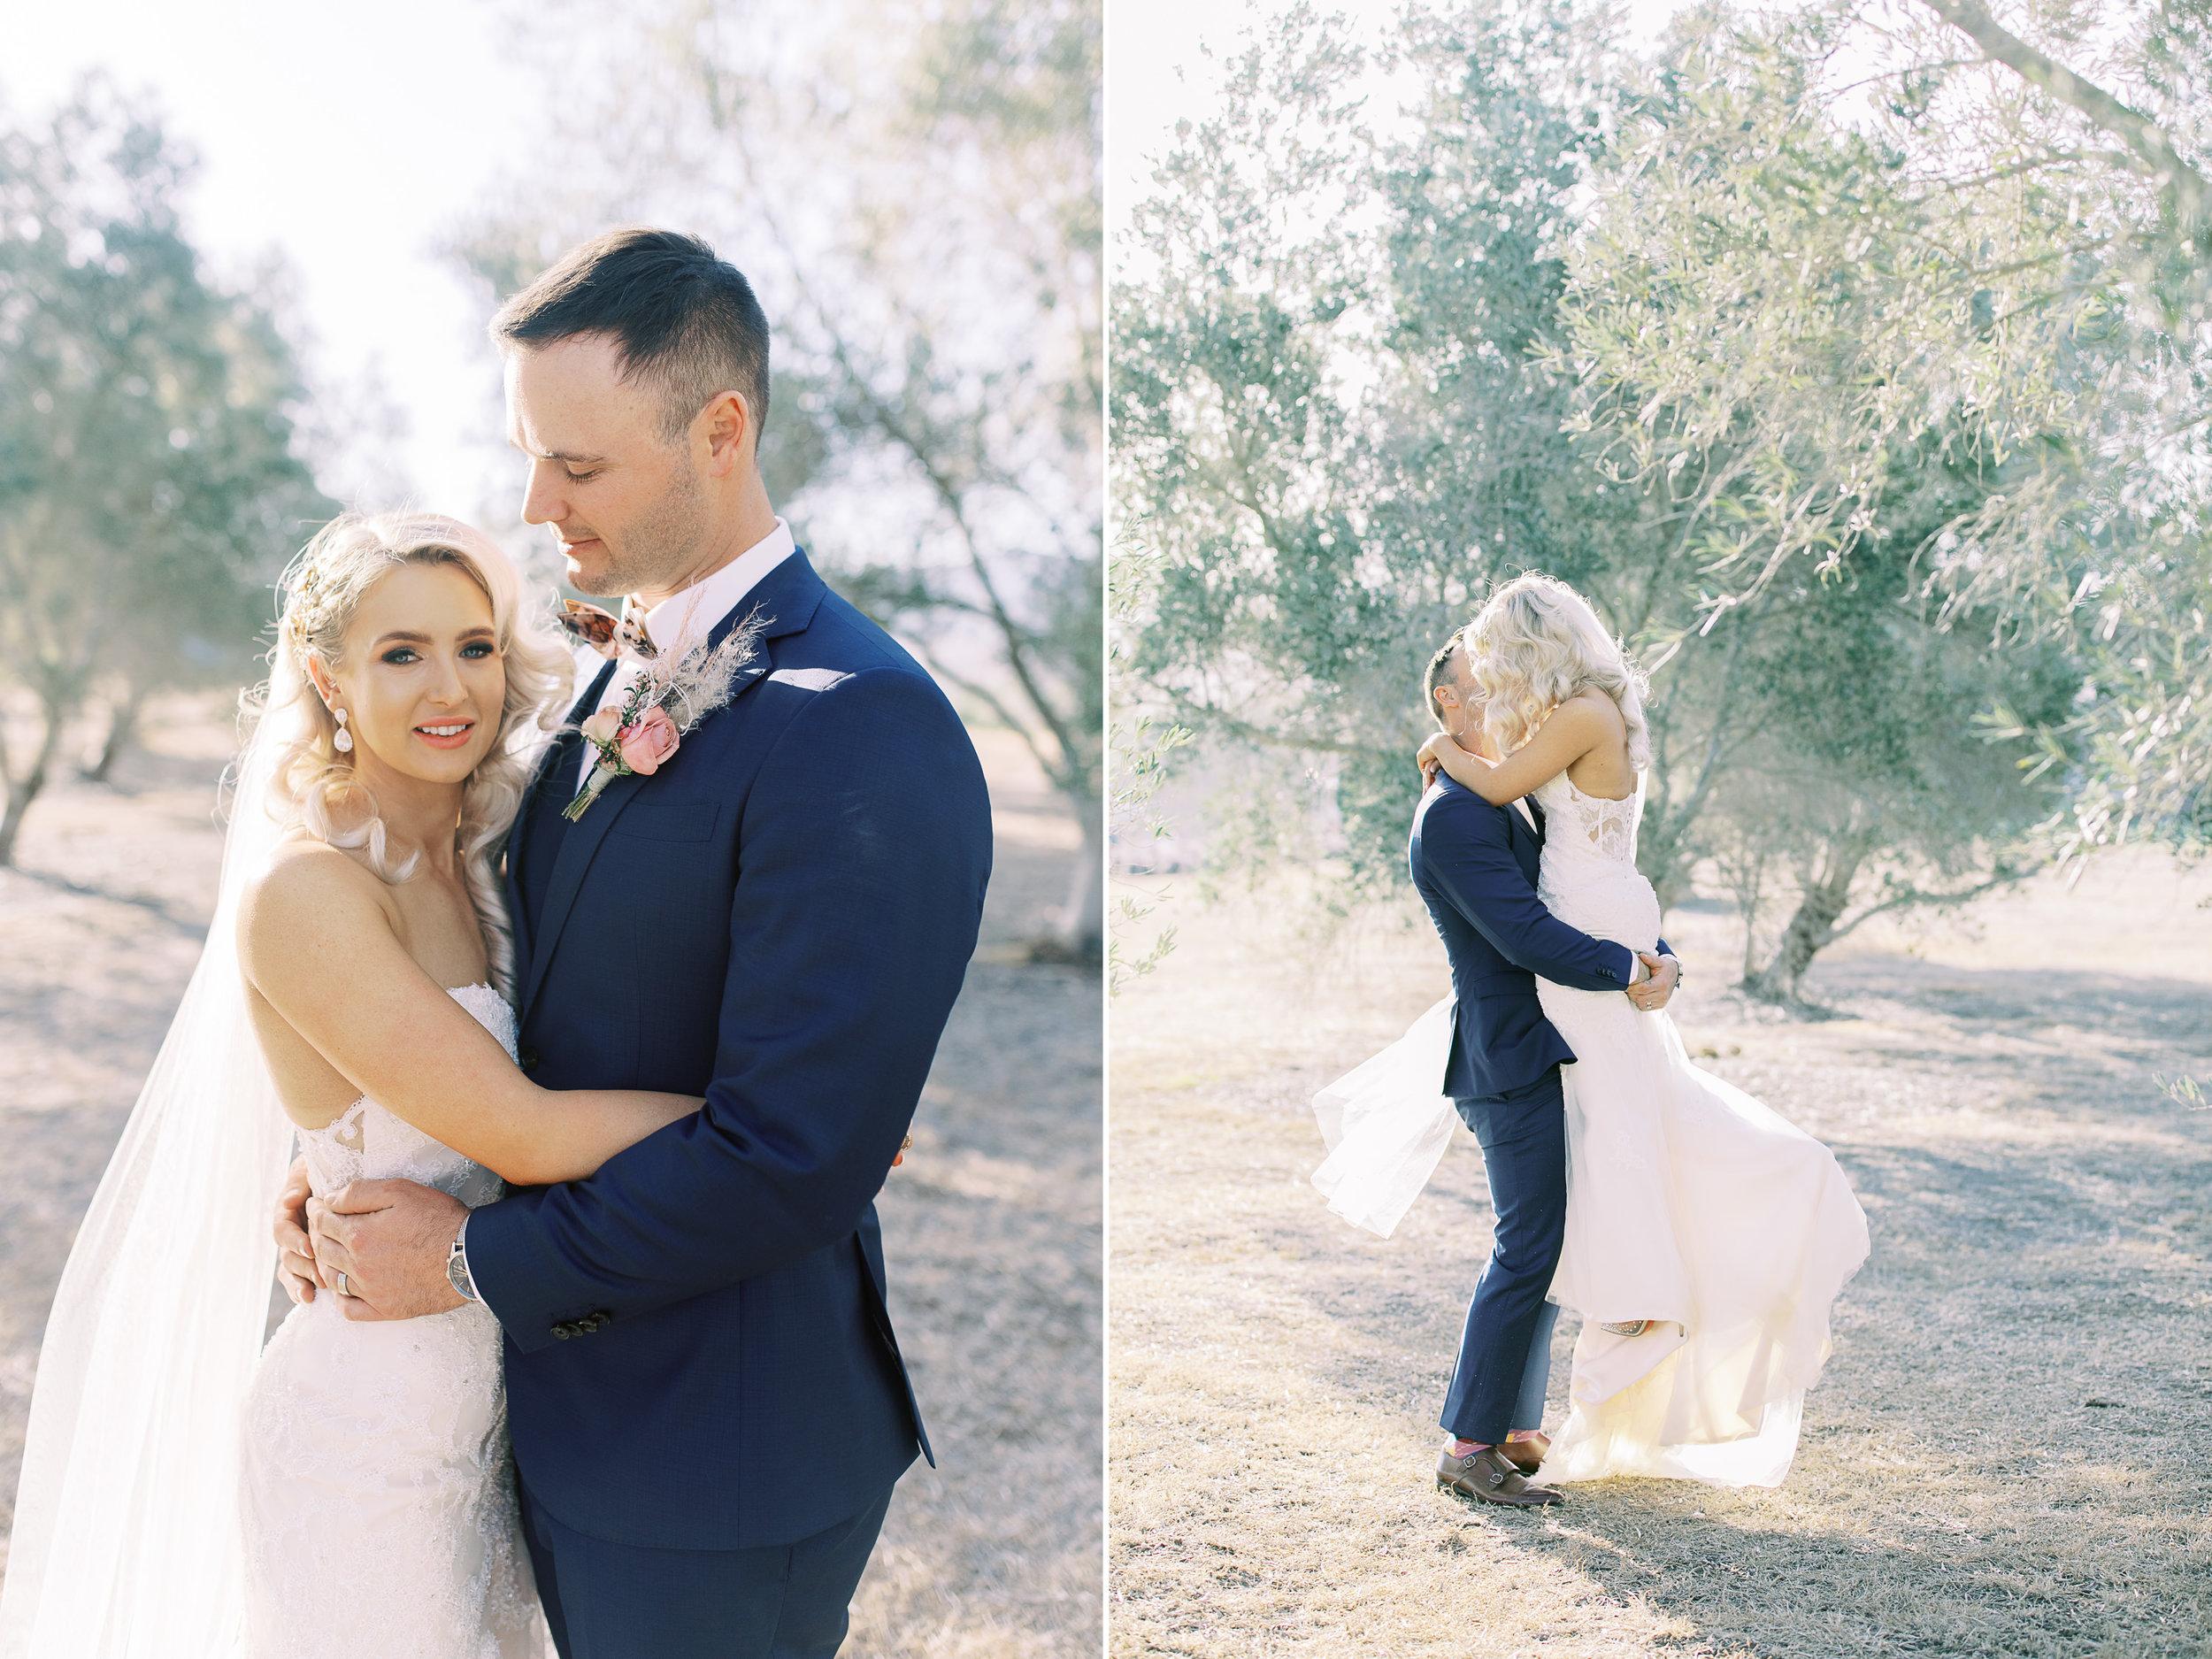 kooroomba-lavendar-farm-film-photography-wedding-photography-romantic-17.jpg